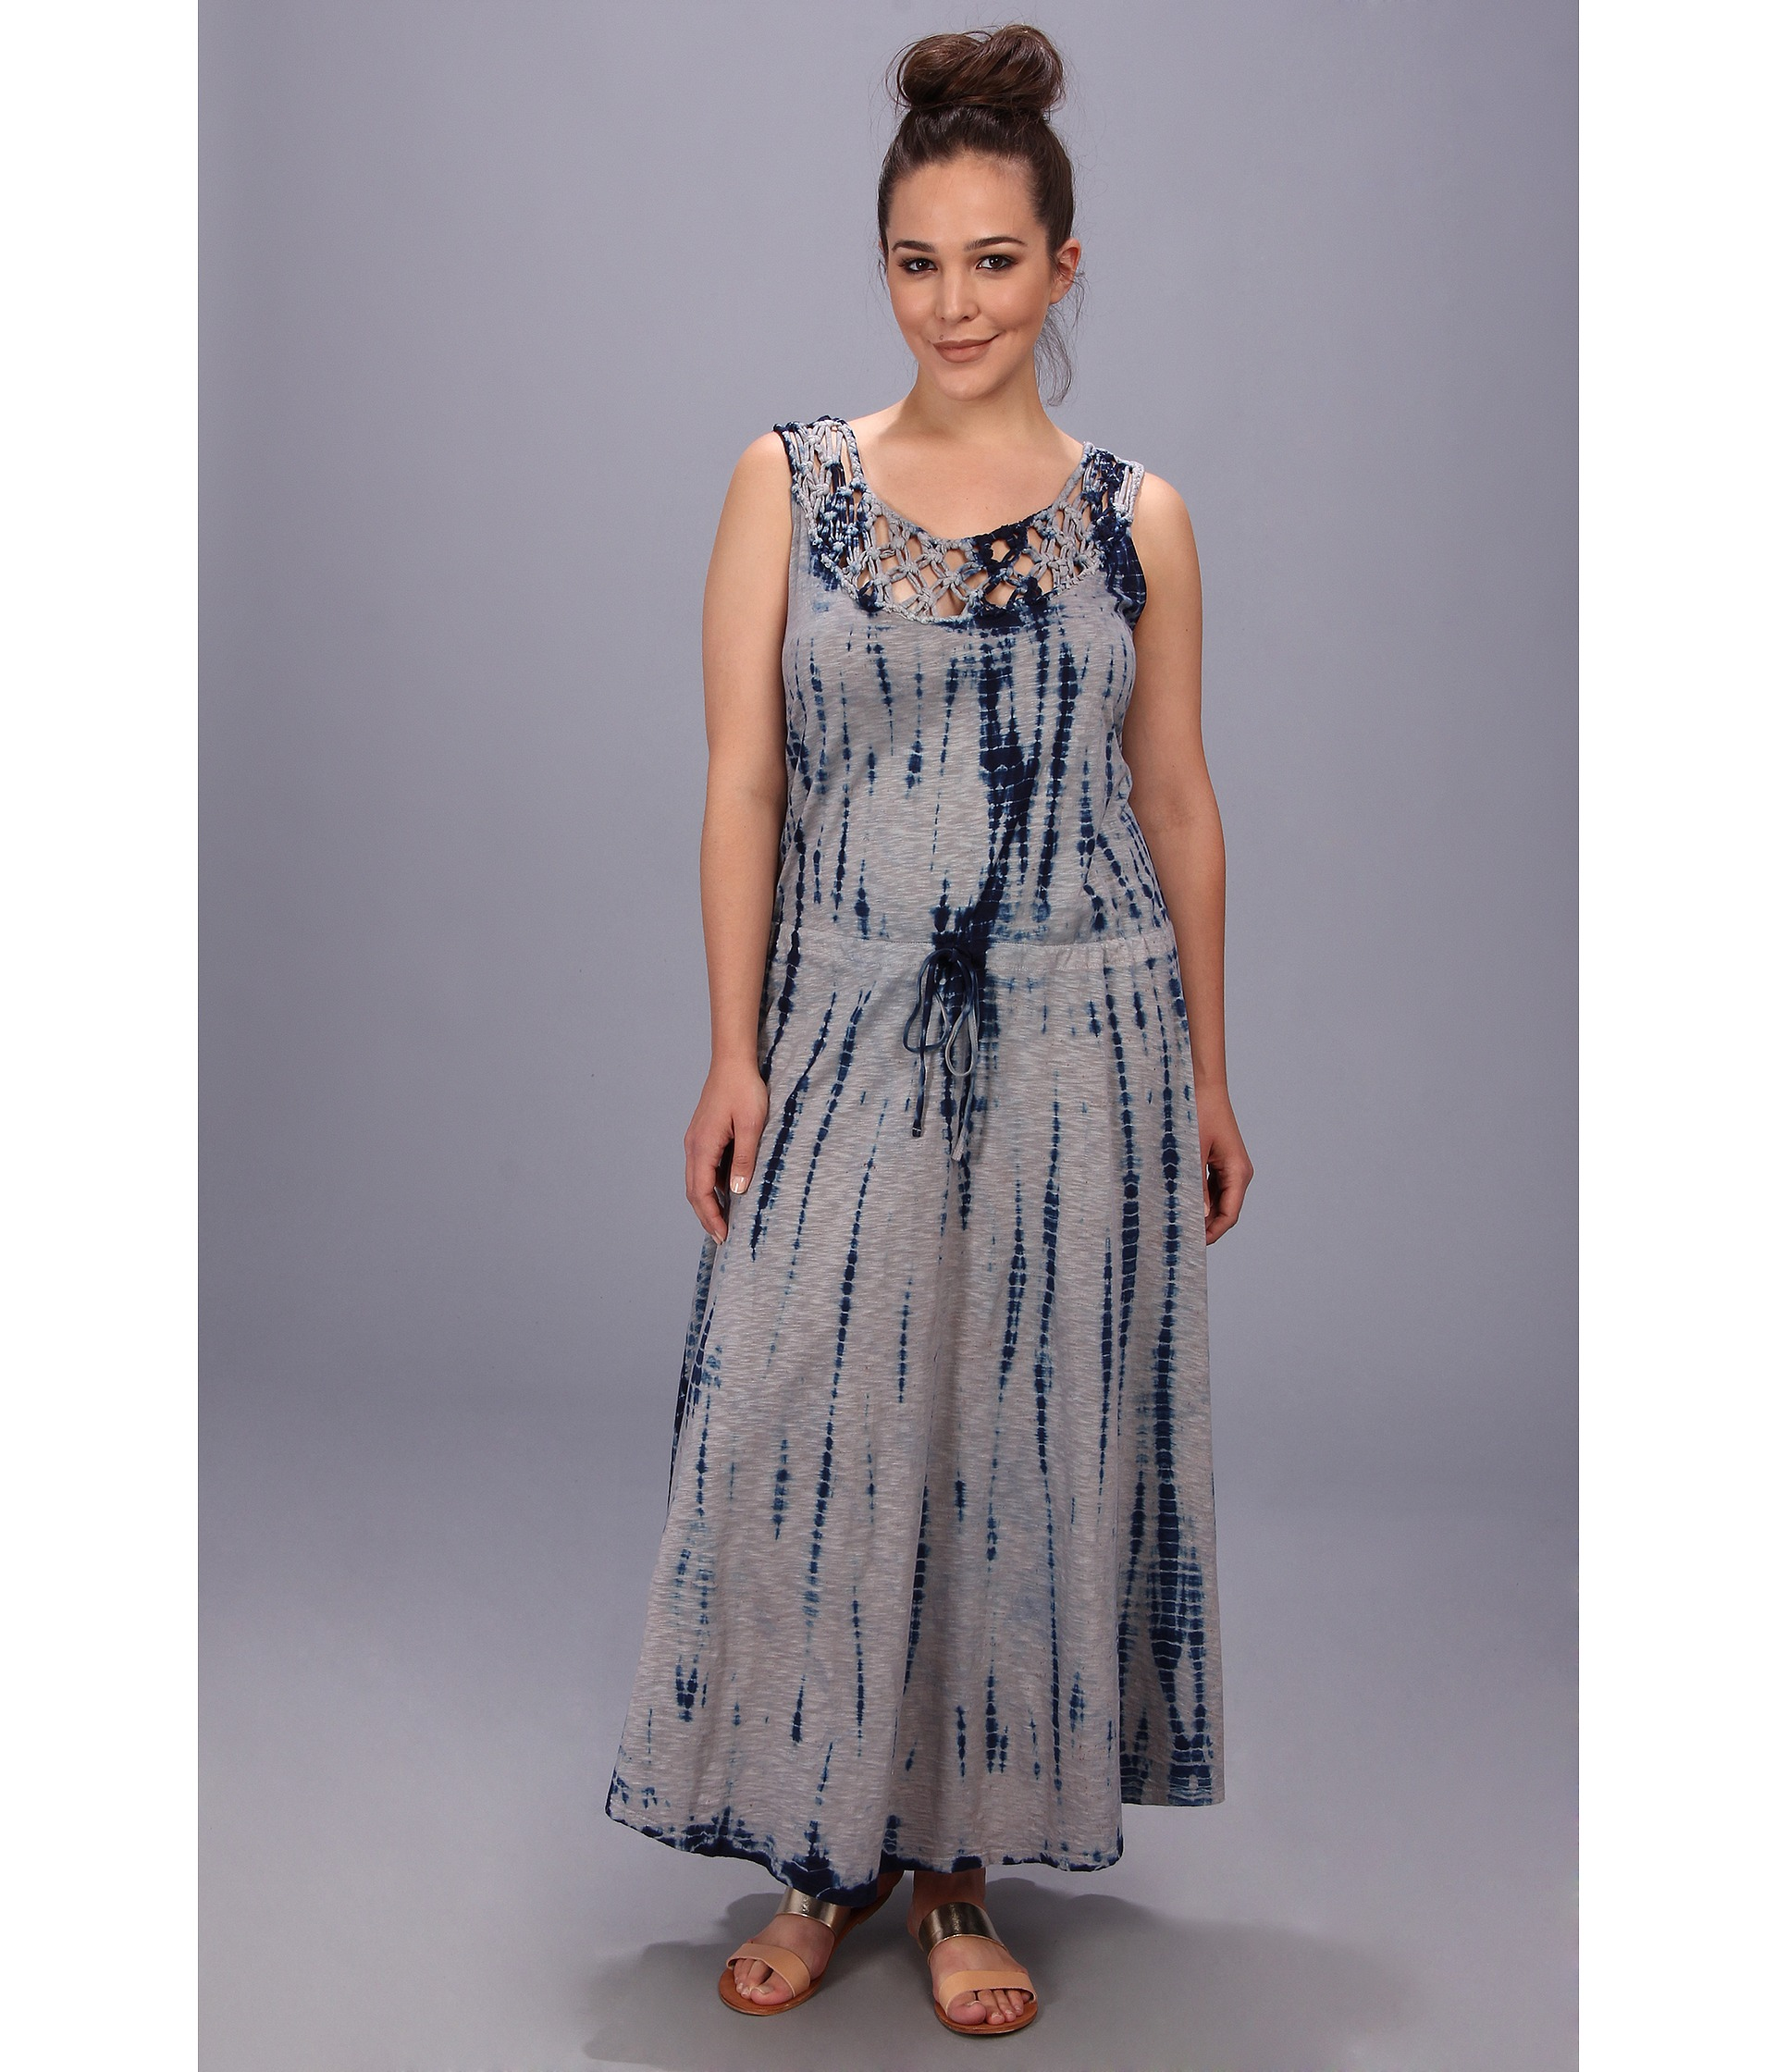 Cato Plus Size Dresses Photo Dress Wallpaper Hd Aorg